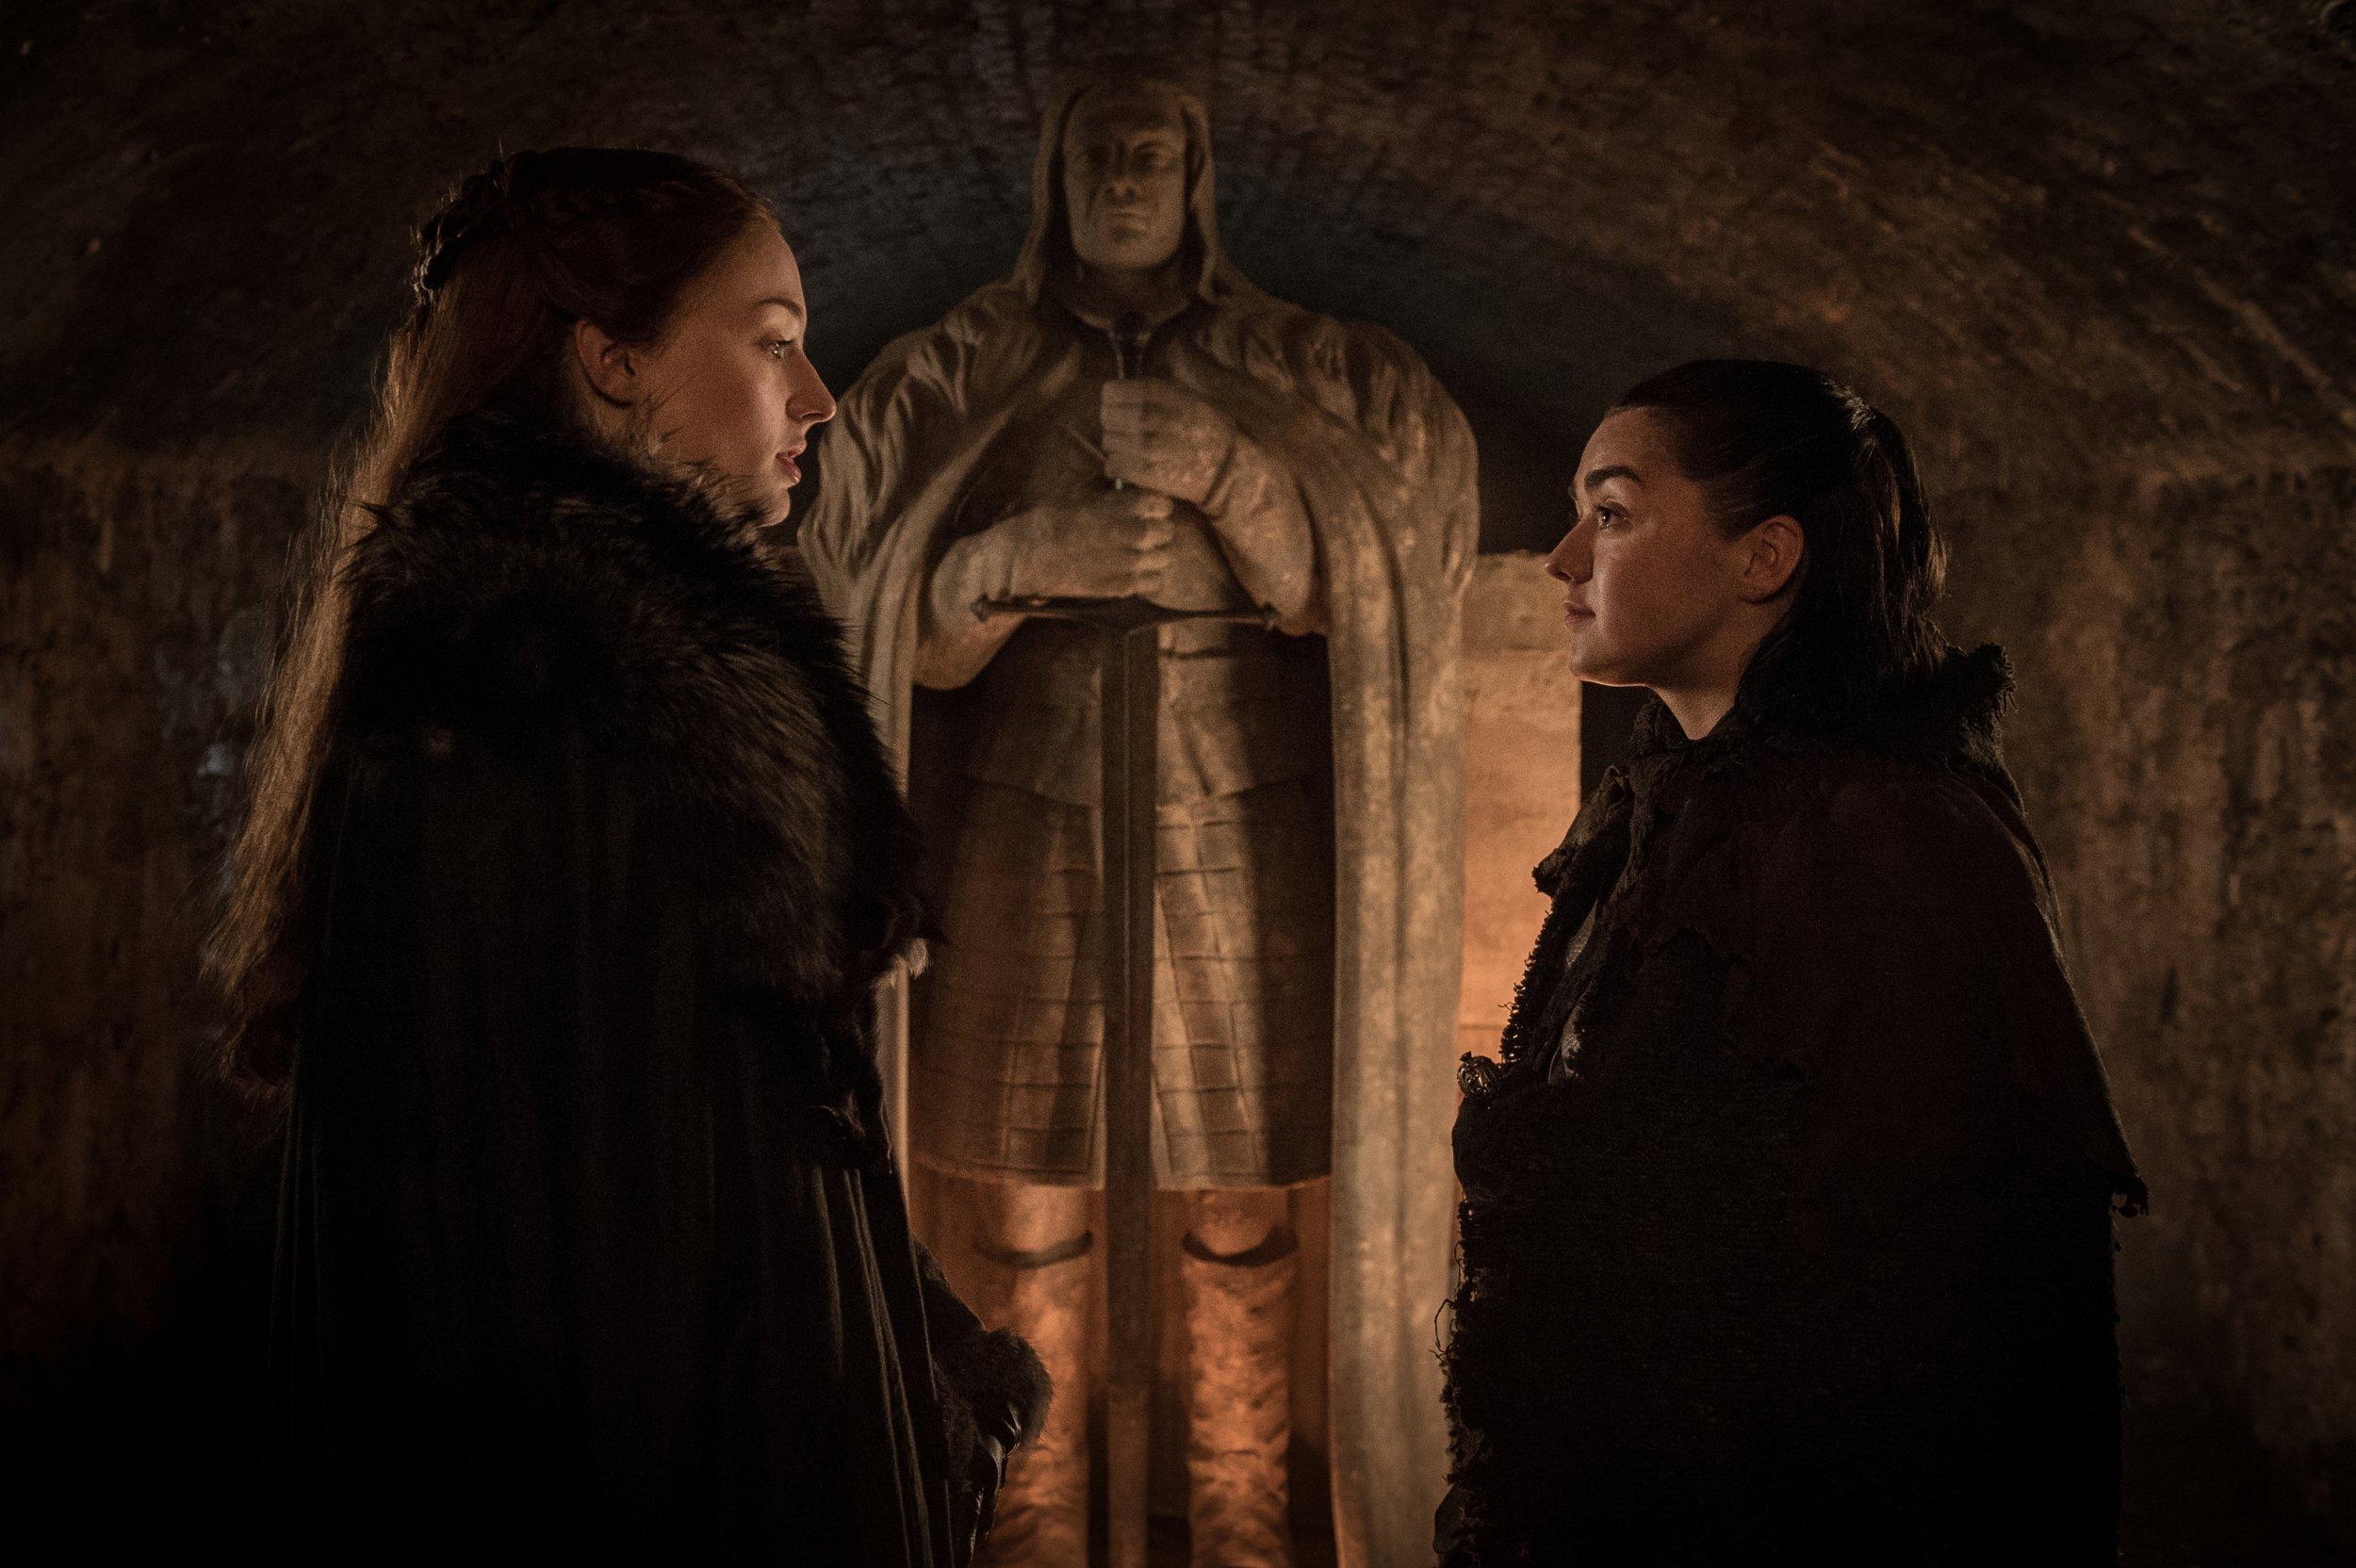 Arya and Sansa reunited